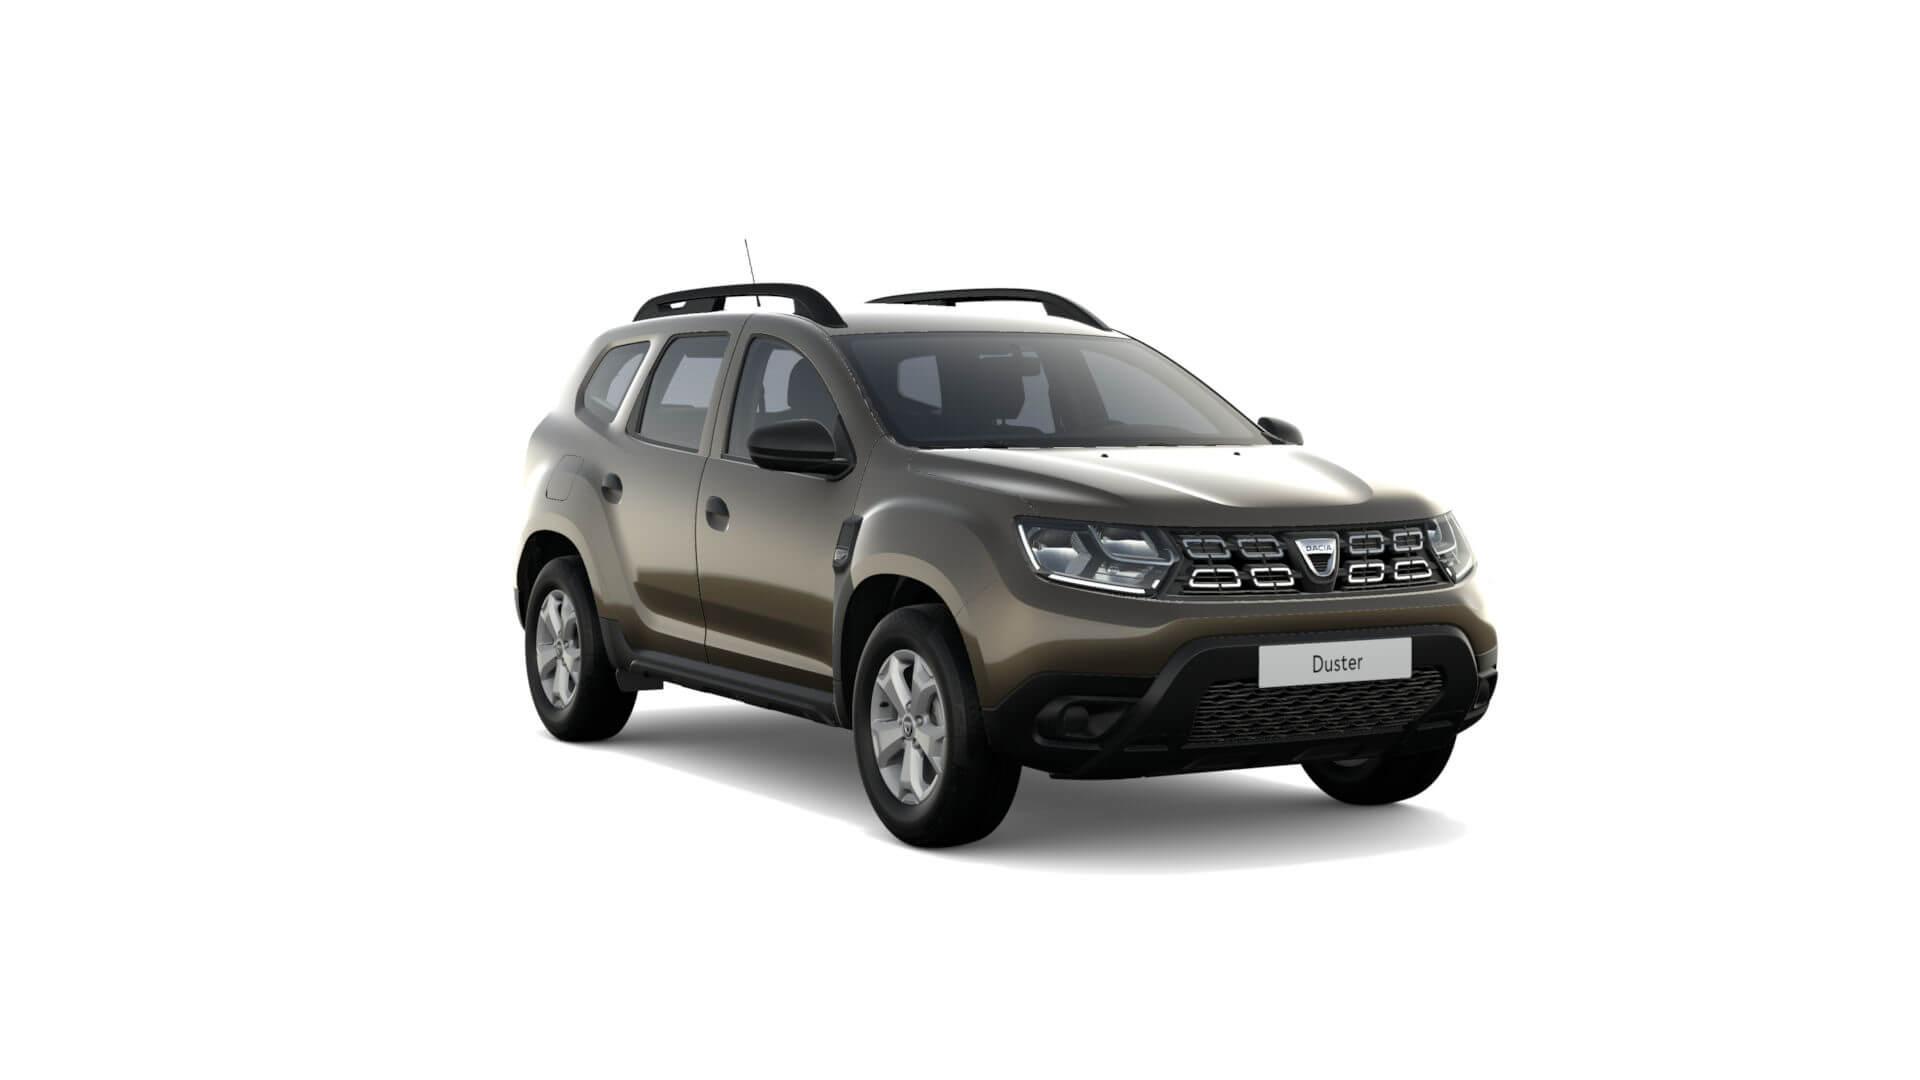 Automodell braungrün - Dacia Duster - Renault Ahrens Hannover